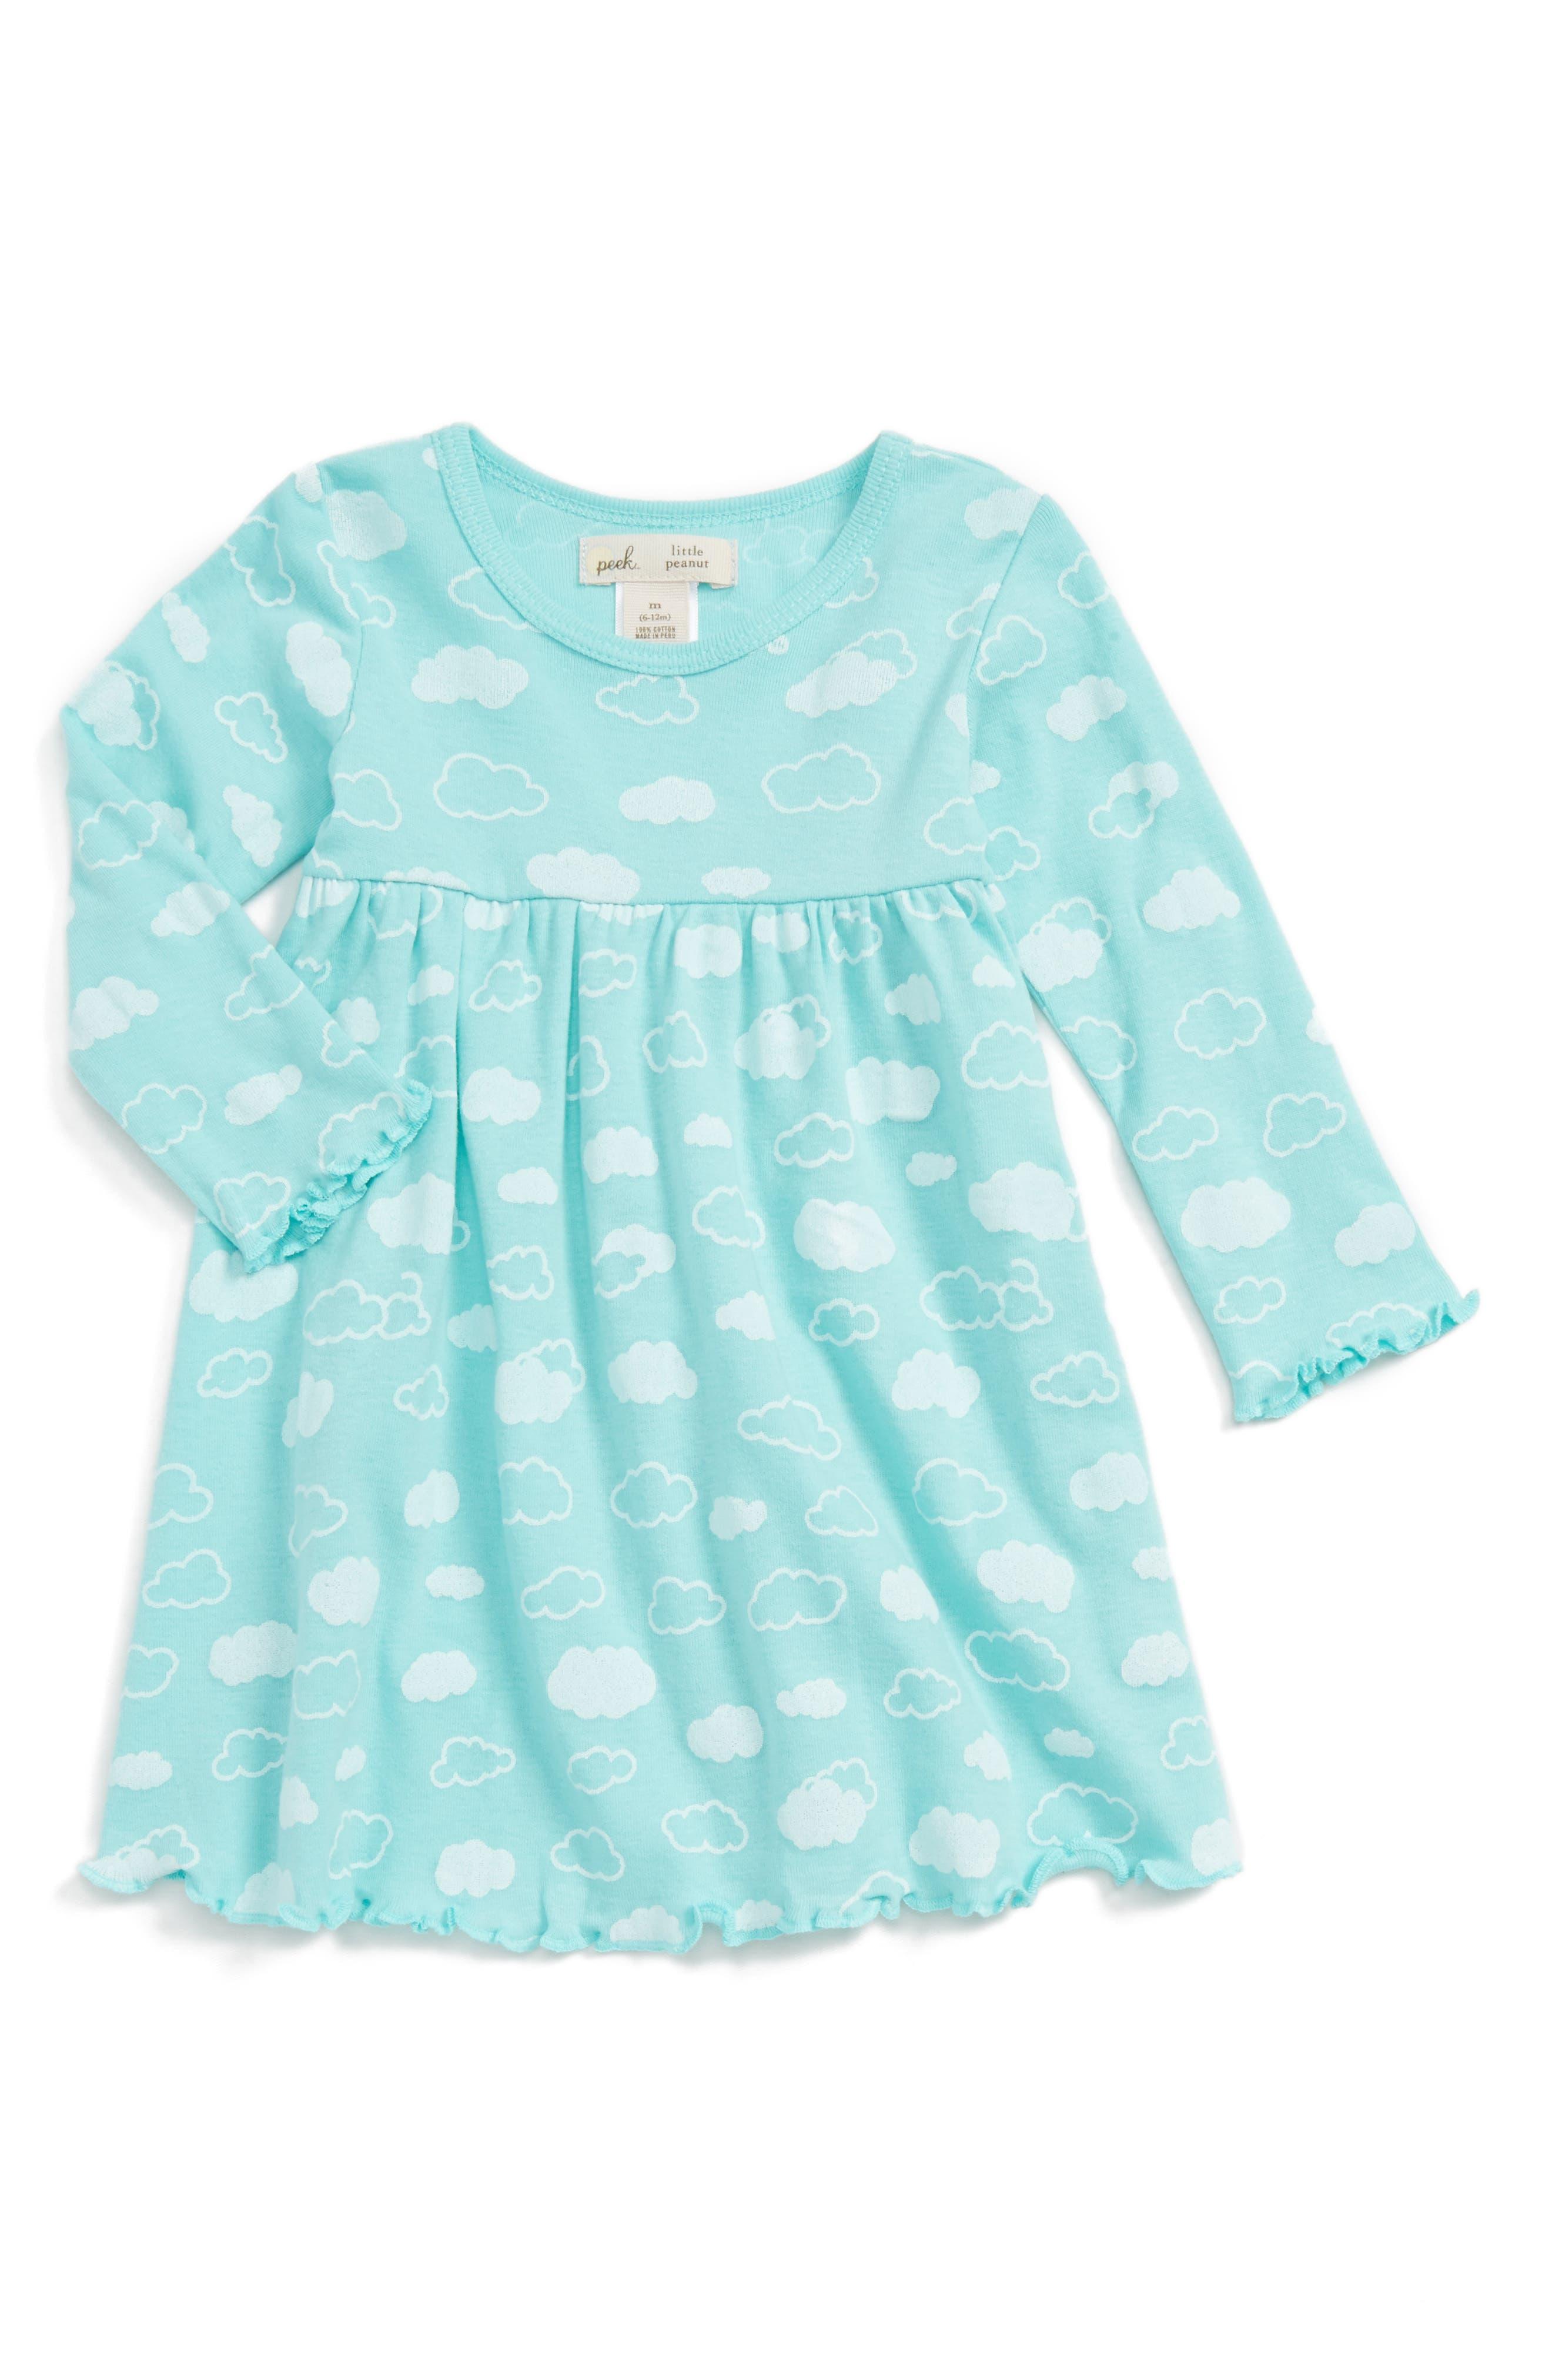 Peek Cloud Dress (Baby)